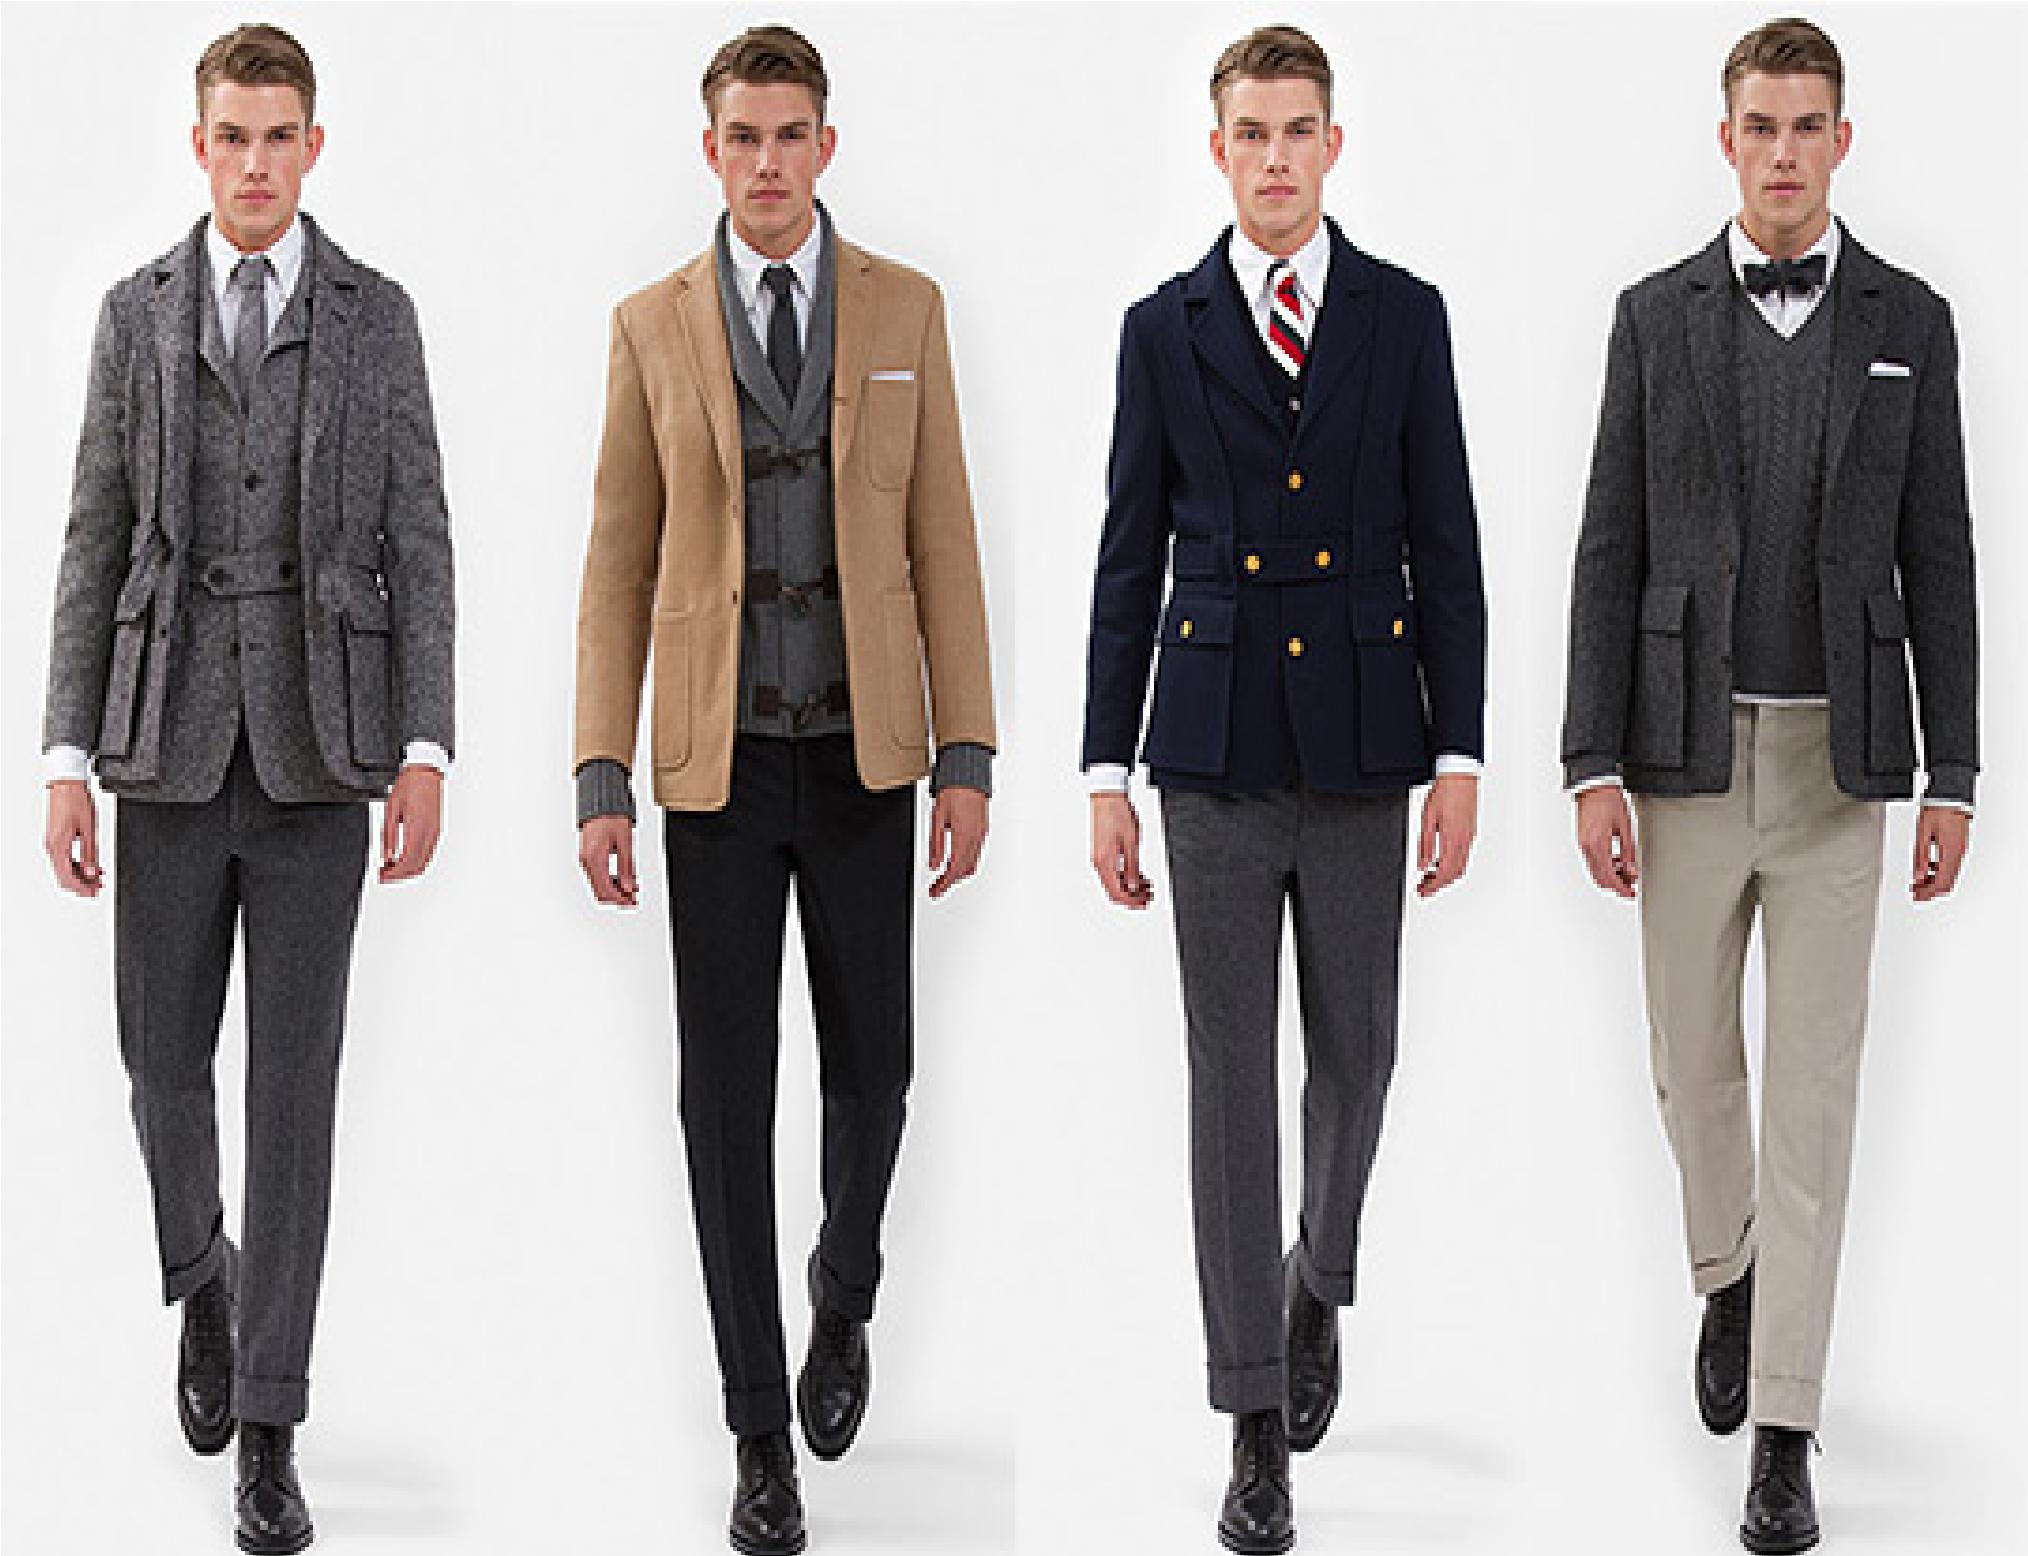 d8e6ce110b1 El vestir formal o clásico... Tips de vestimenta para hombres